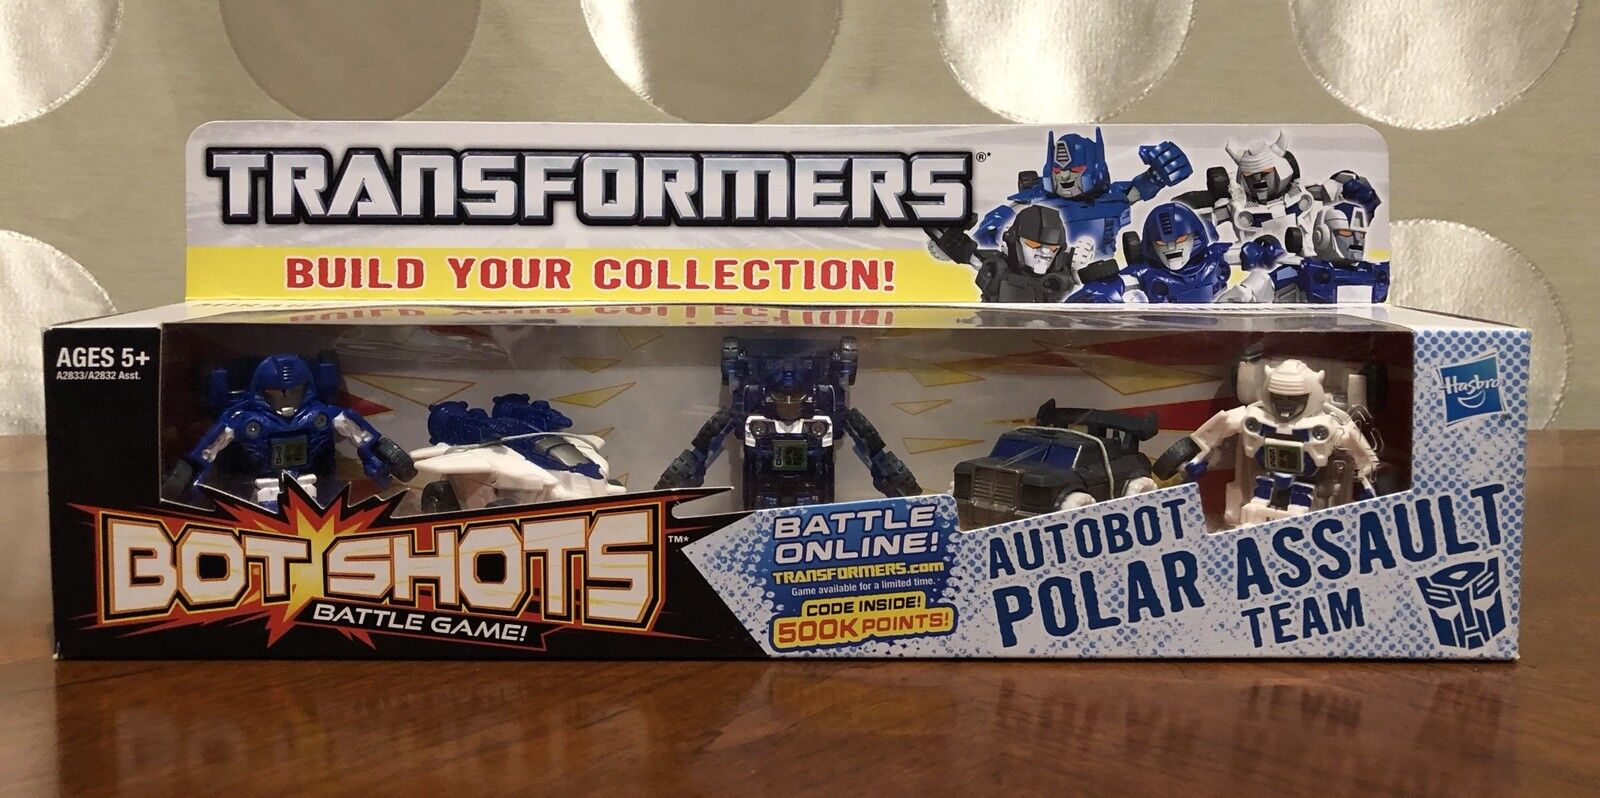 Hasbro Transformers - Botshots Battle Game